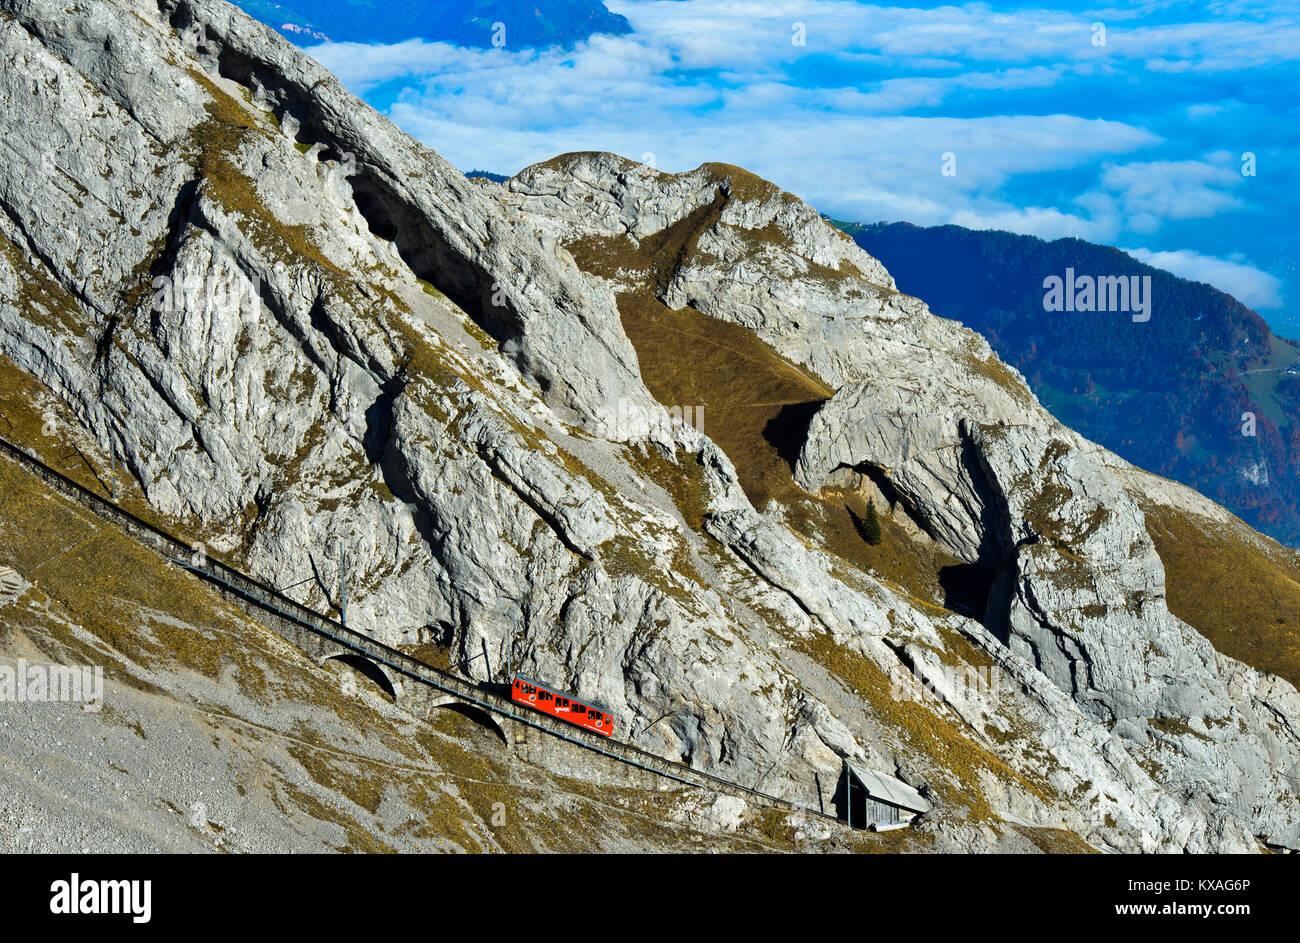 Red wagon of the Pilatus Railway at Mount Pilatus,Alpnachstad,Switzerland - Stock Image